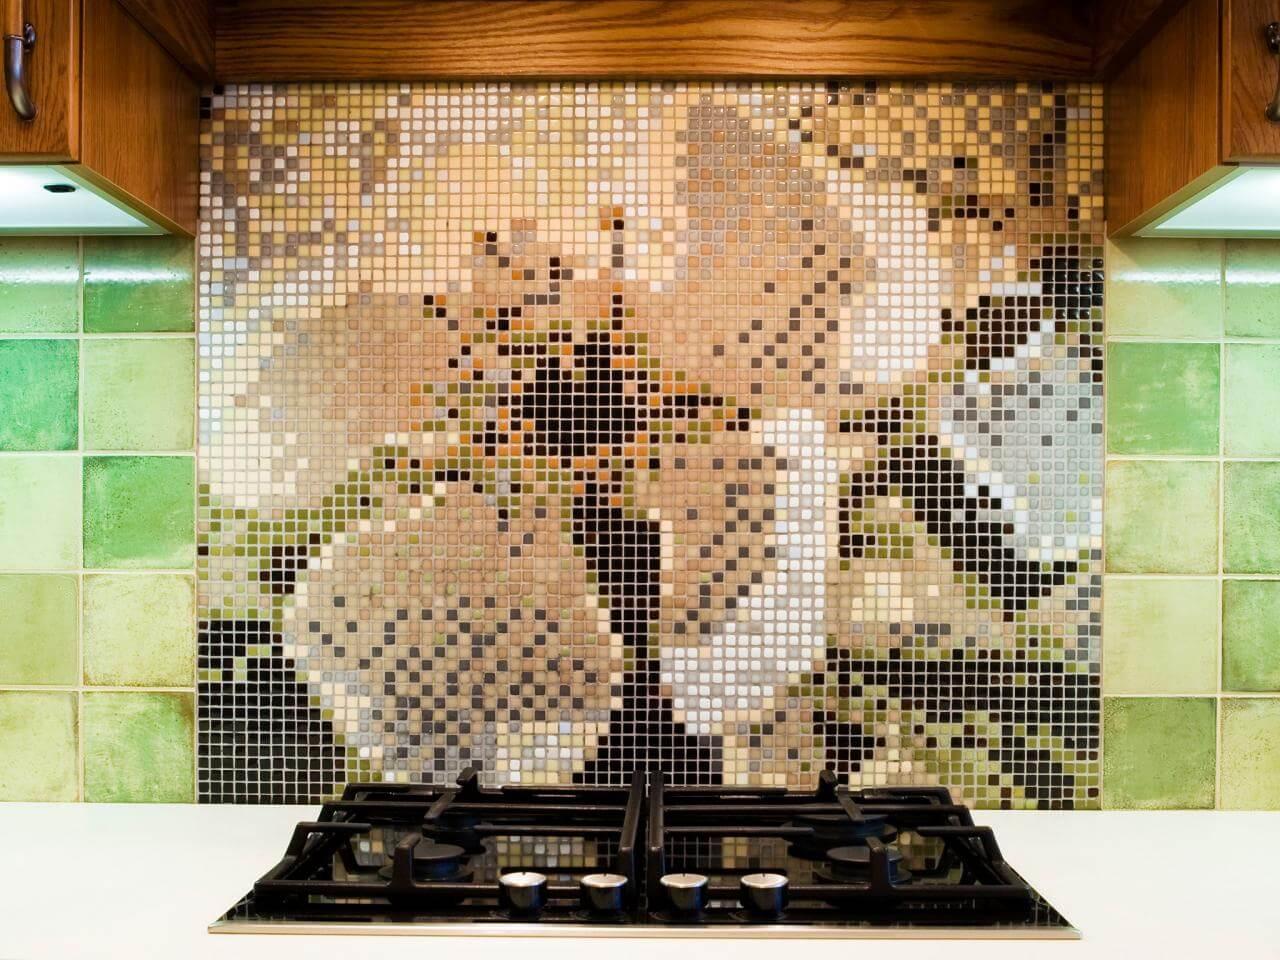 Super creative cool kitchen splashback